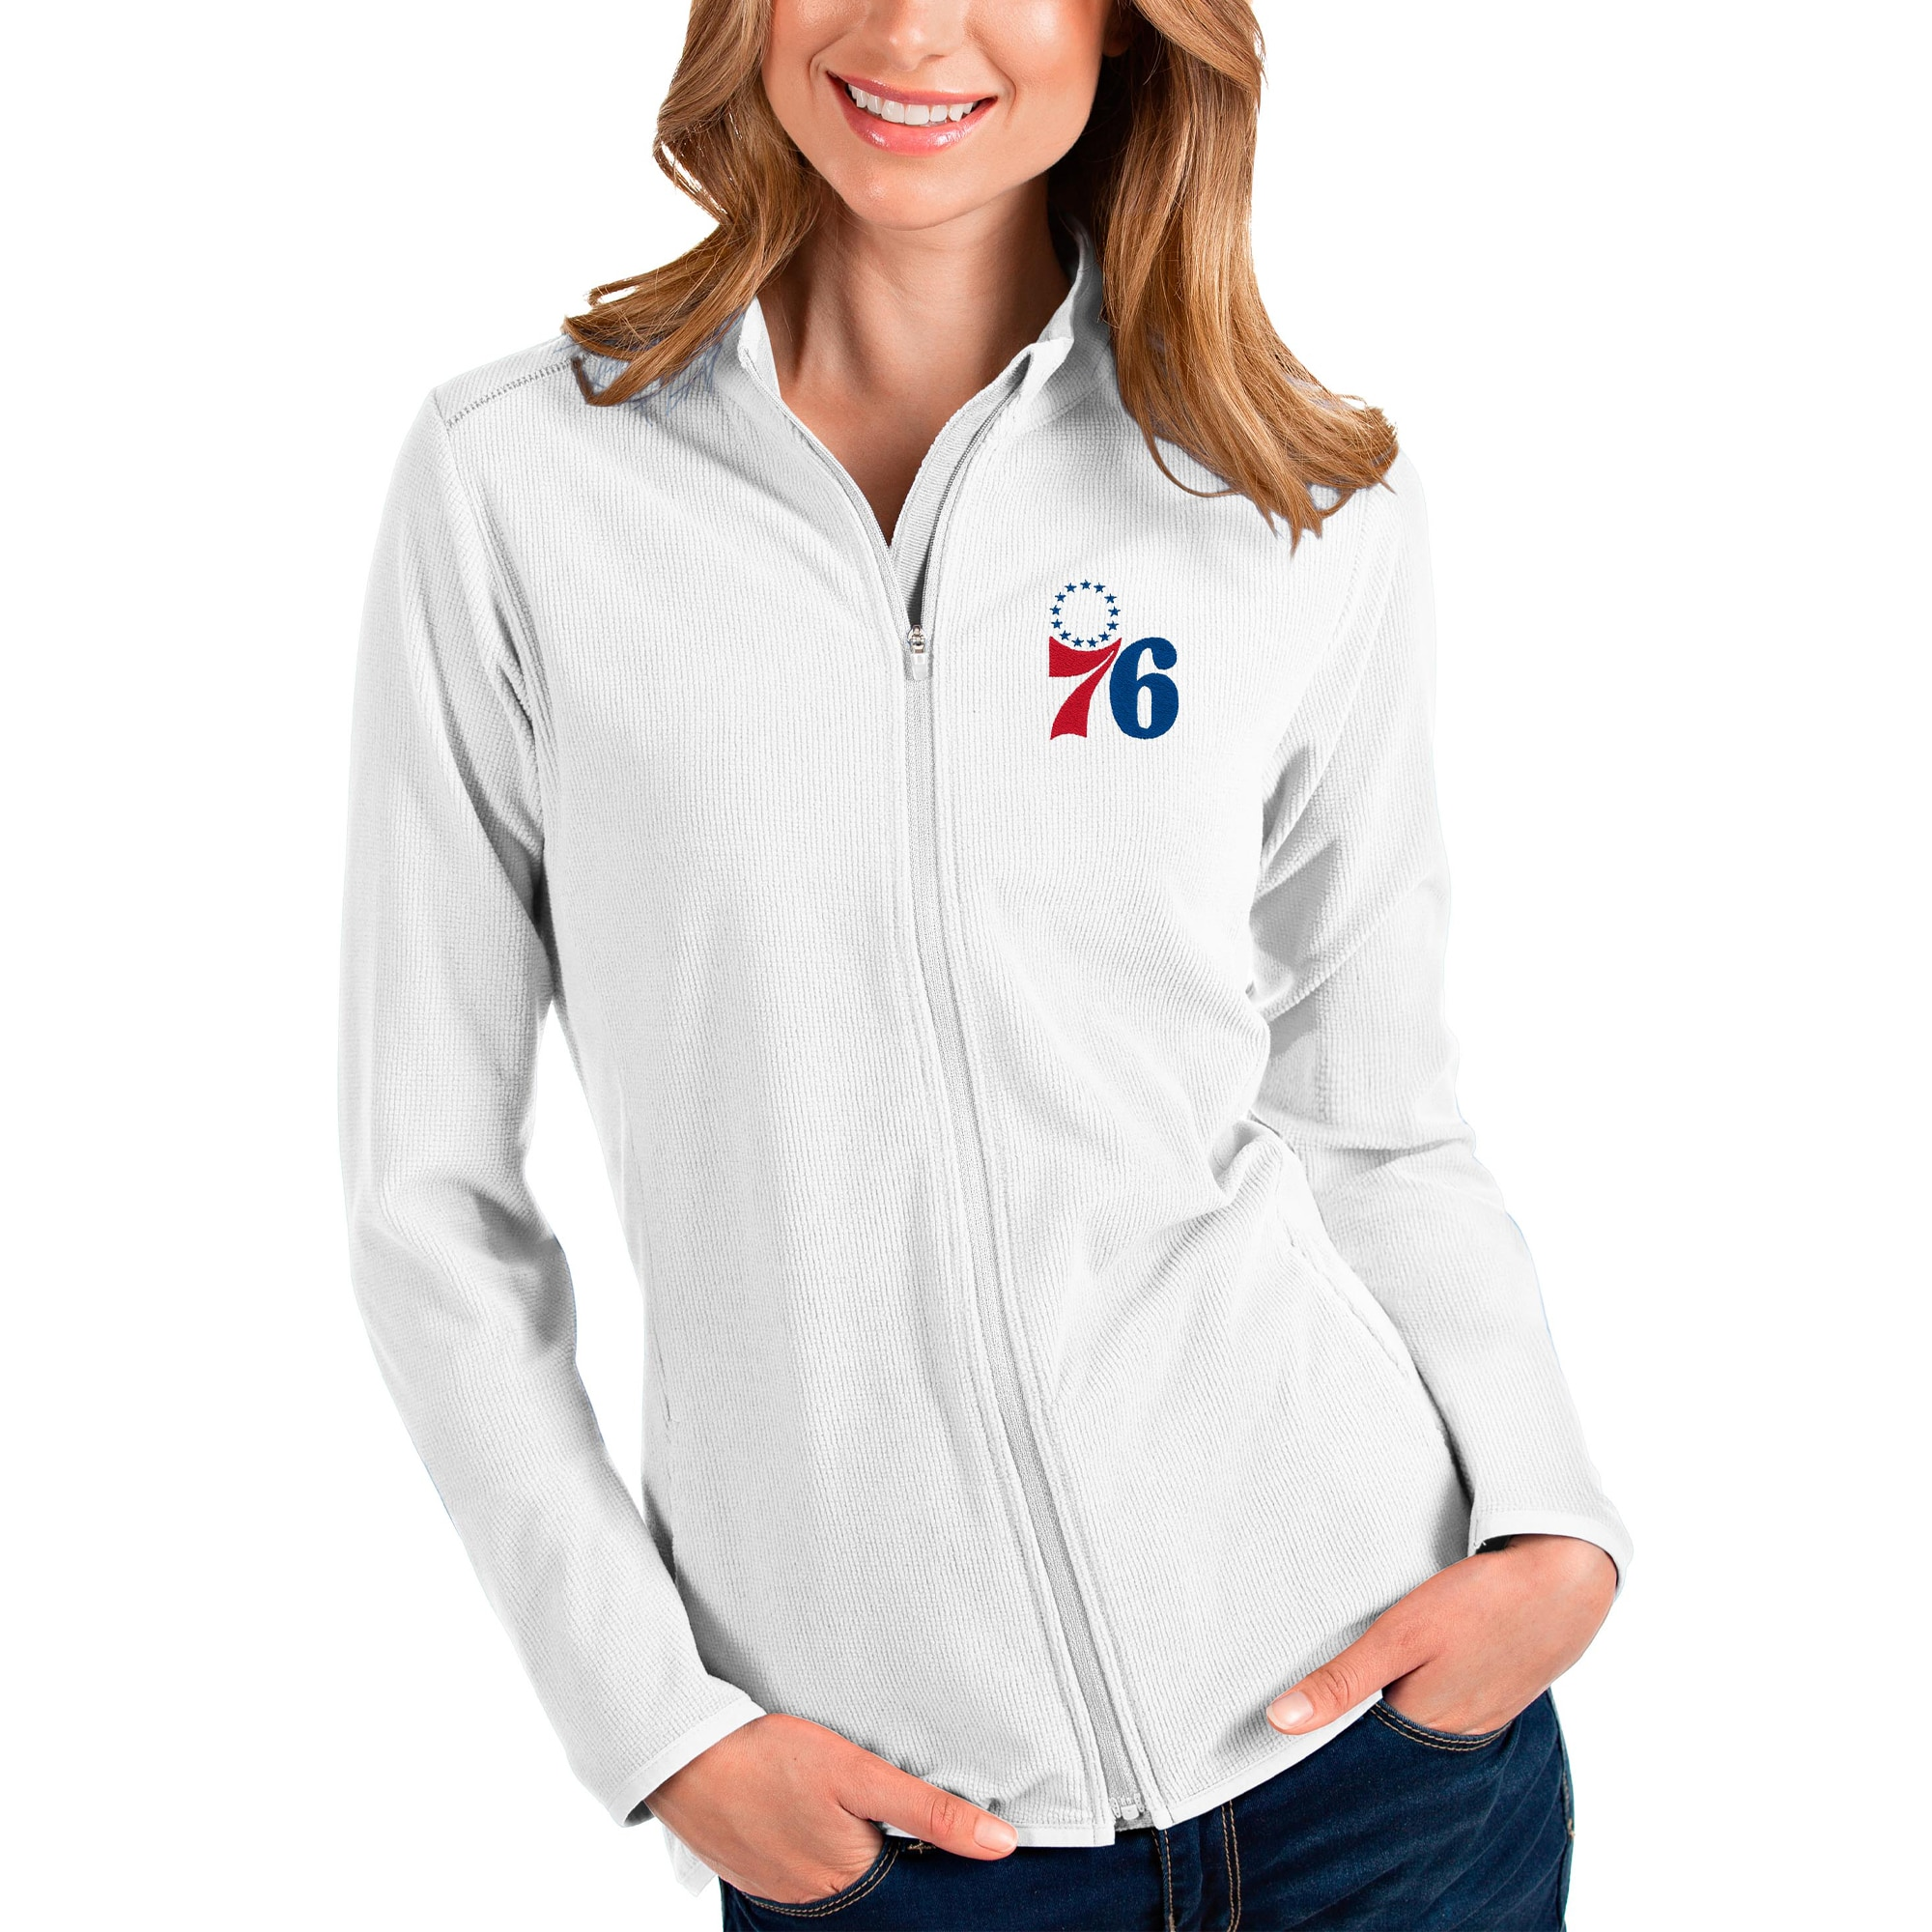 Philadelphia 76ers Antigua Women's Glacier Full-Zip Jacket - White